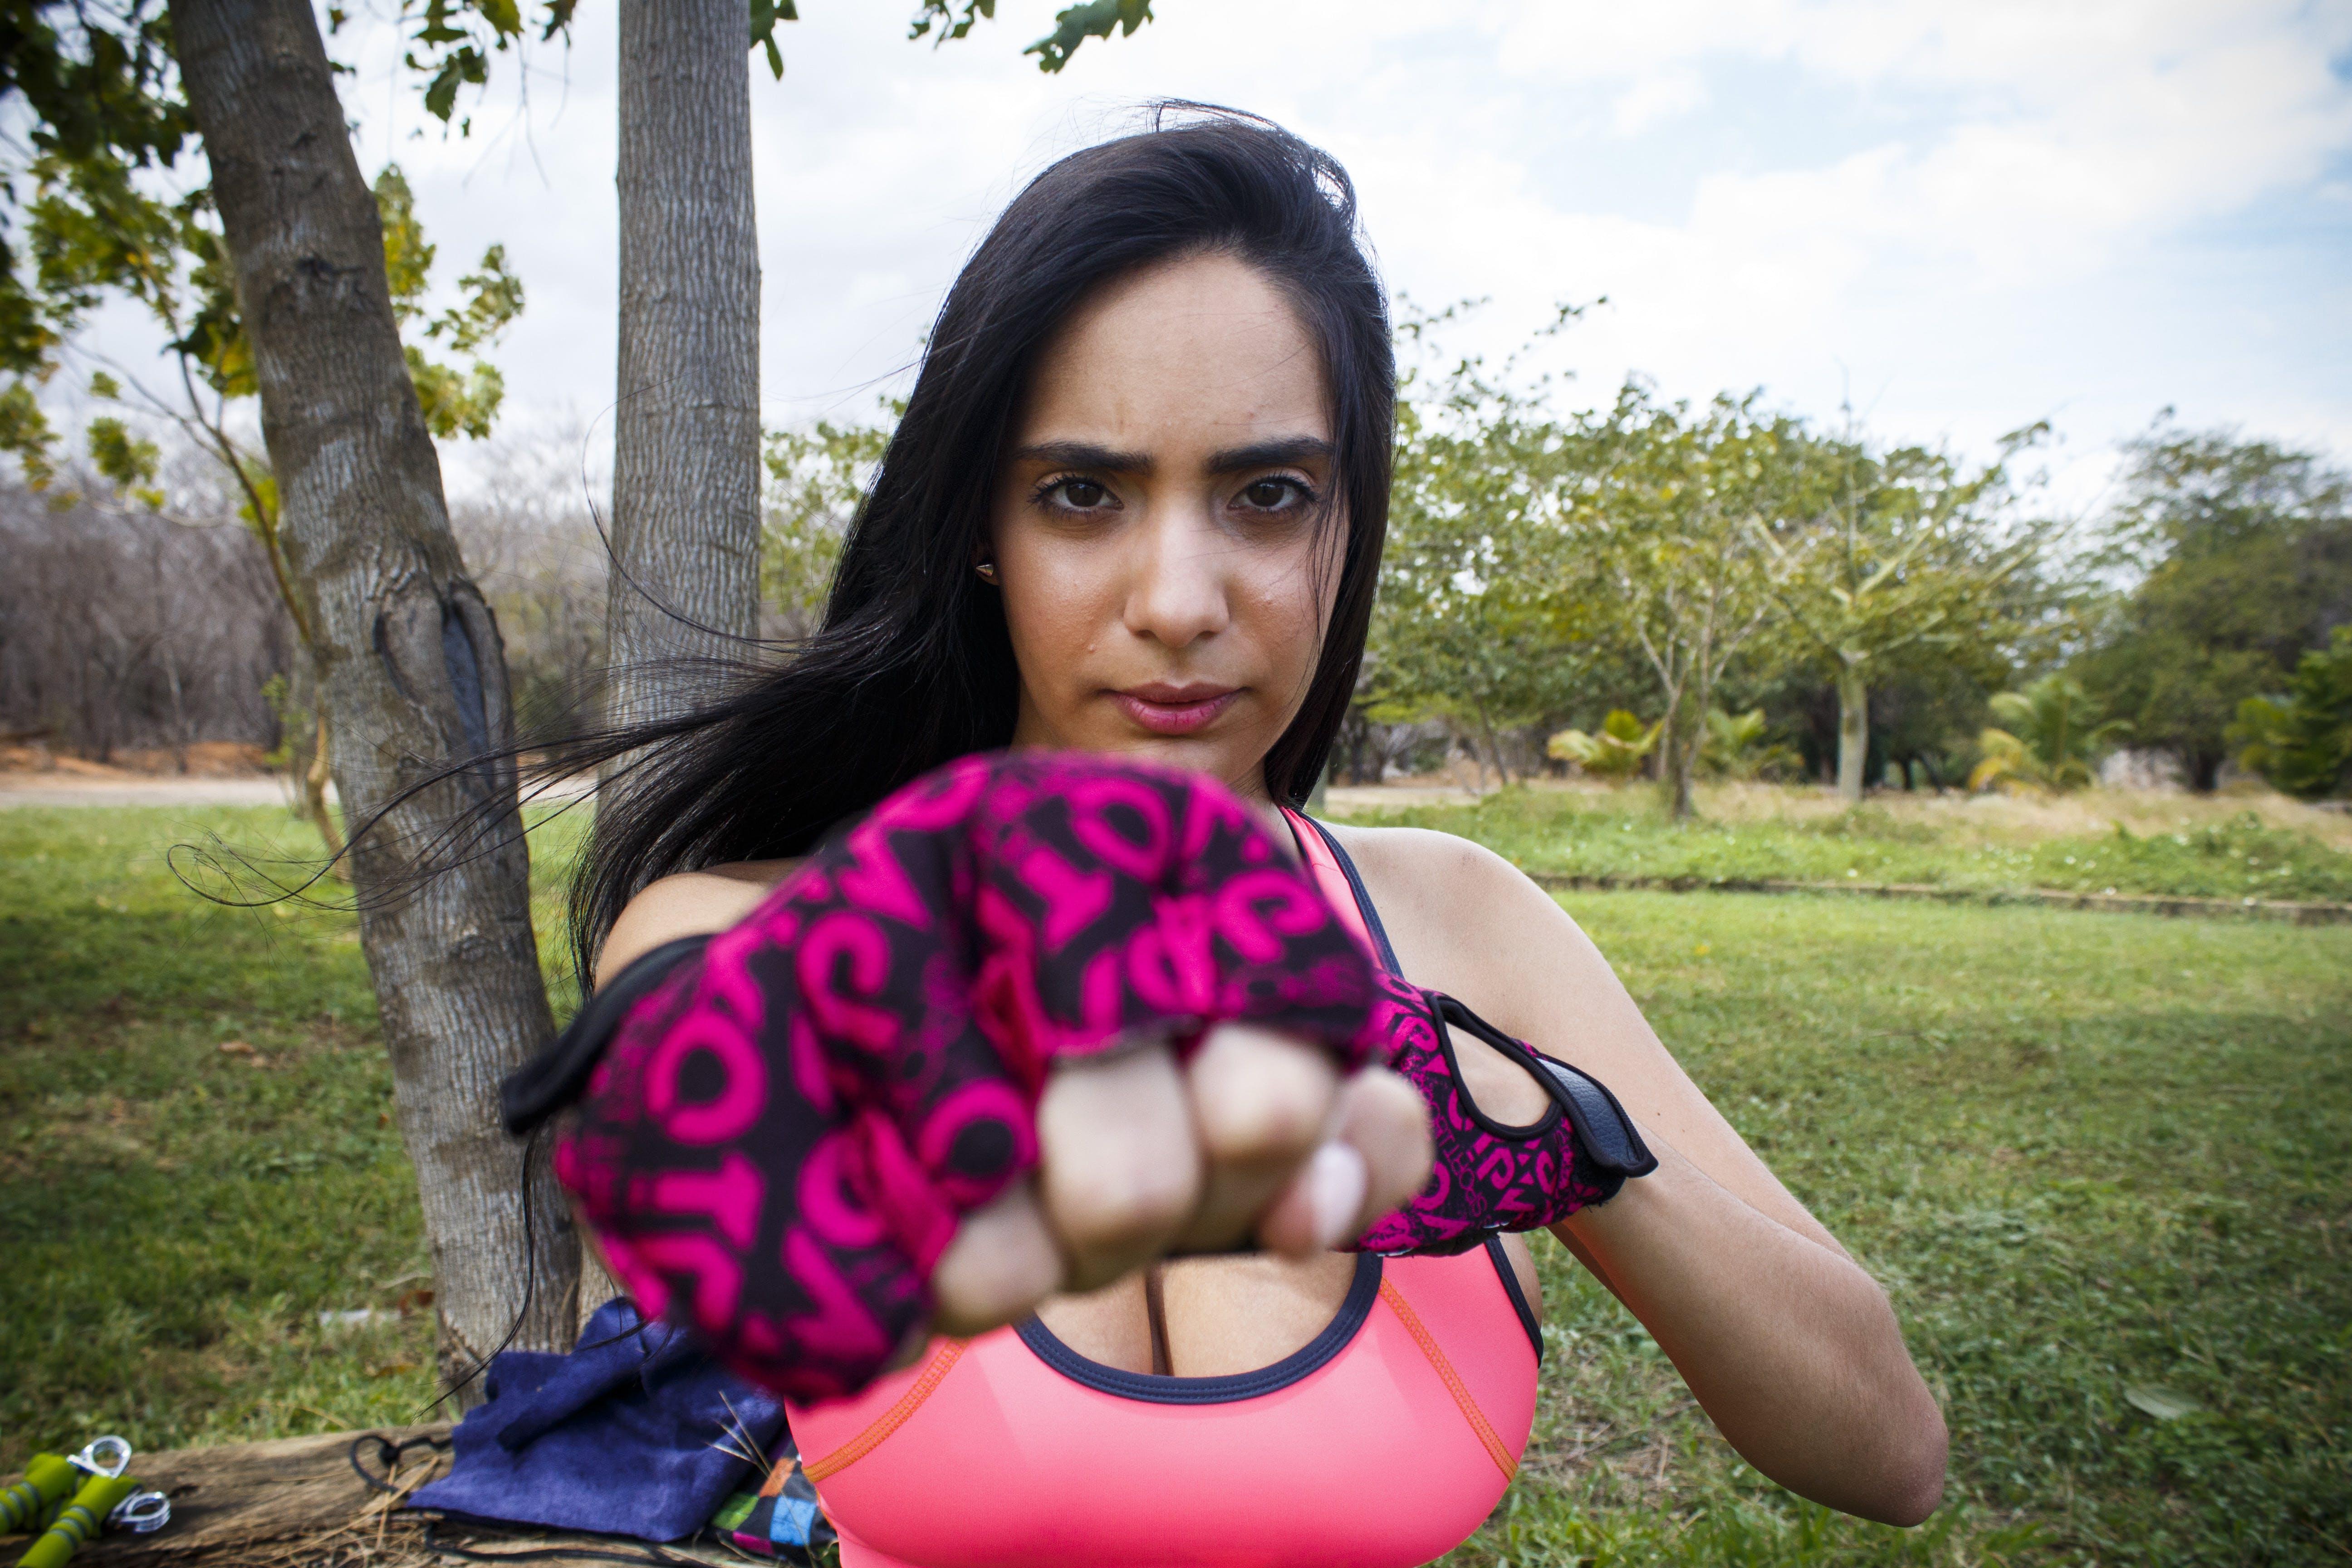 Free stock photo of fist, fitness model, gloves, latin girl